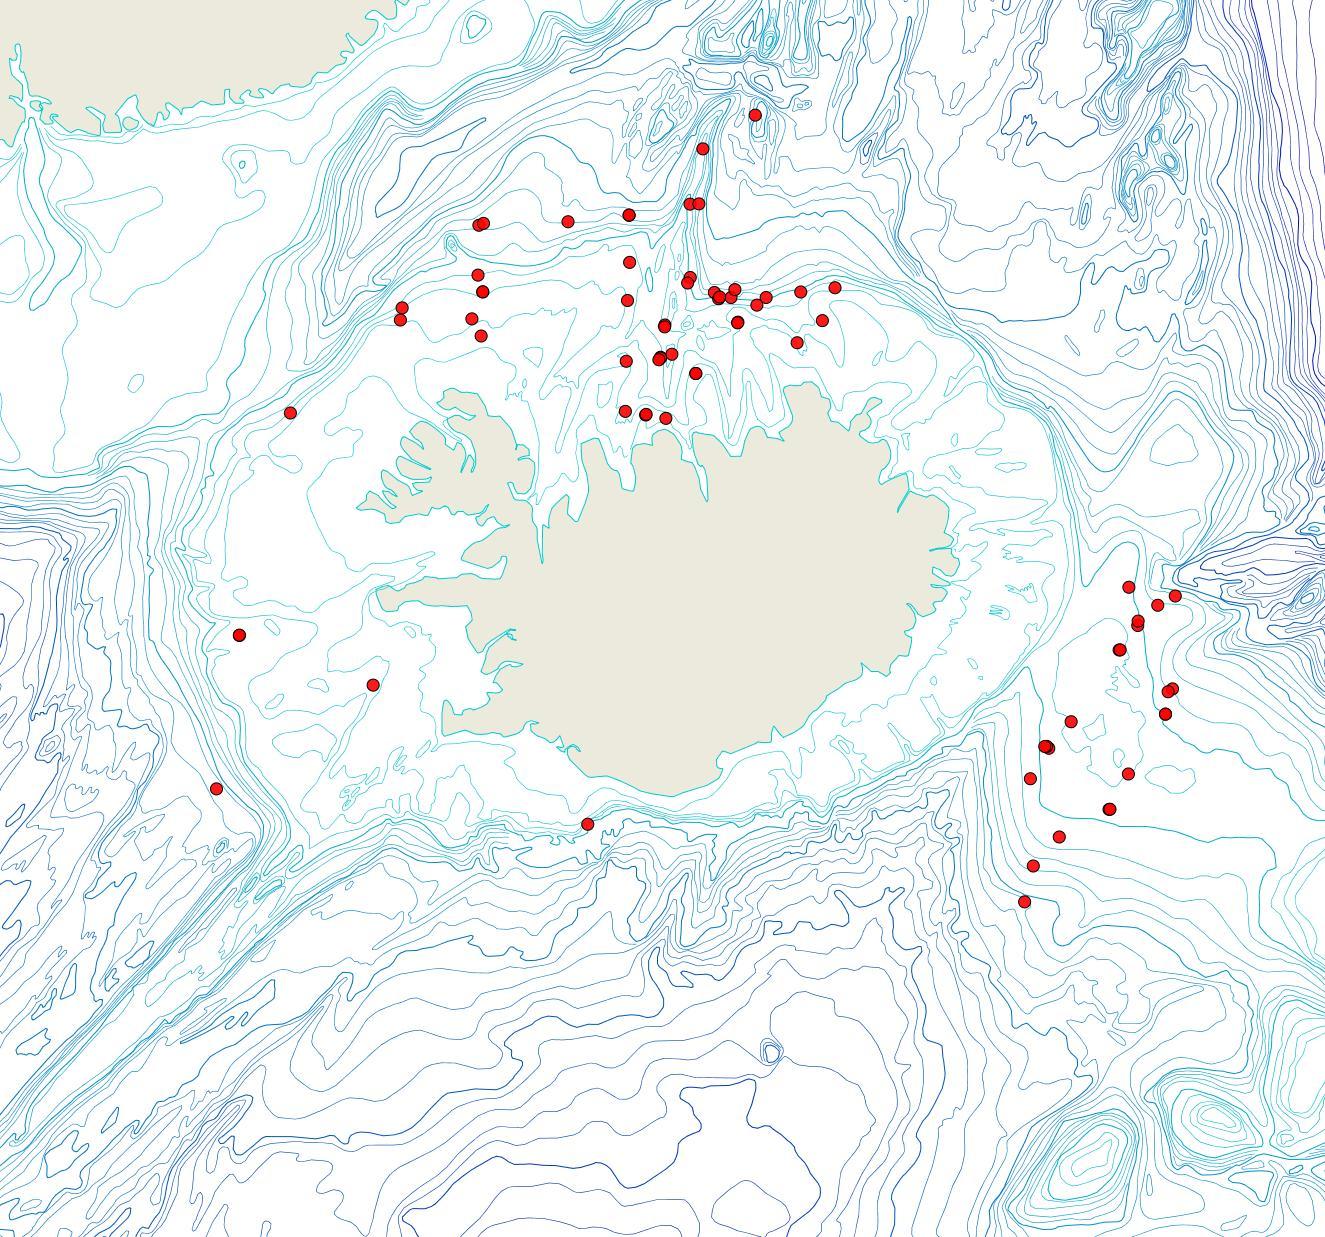 Útbreiðsla Escharella labiata(Bioice samples, red dots)